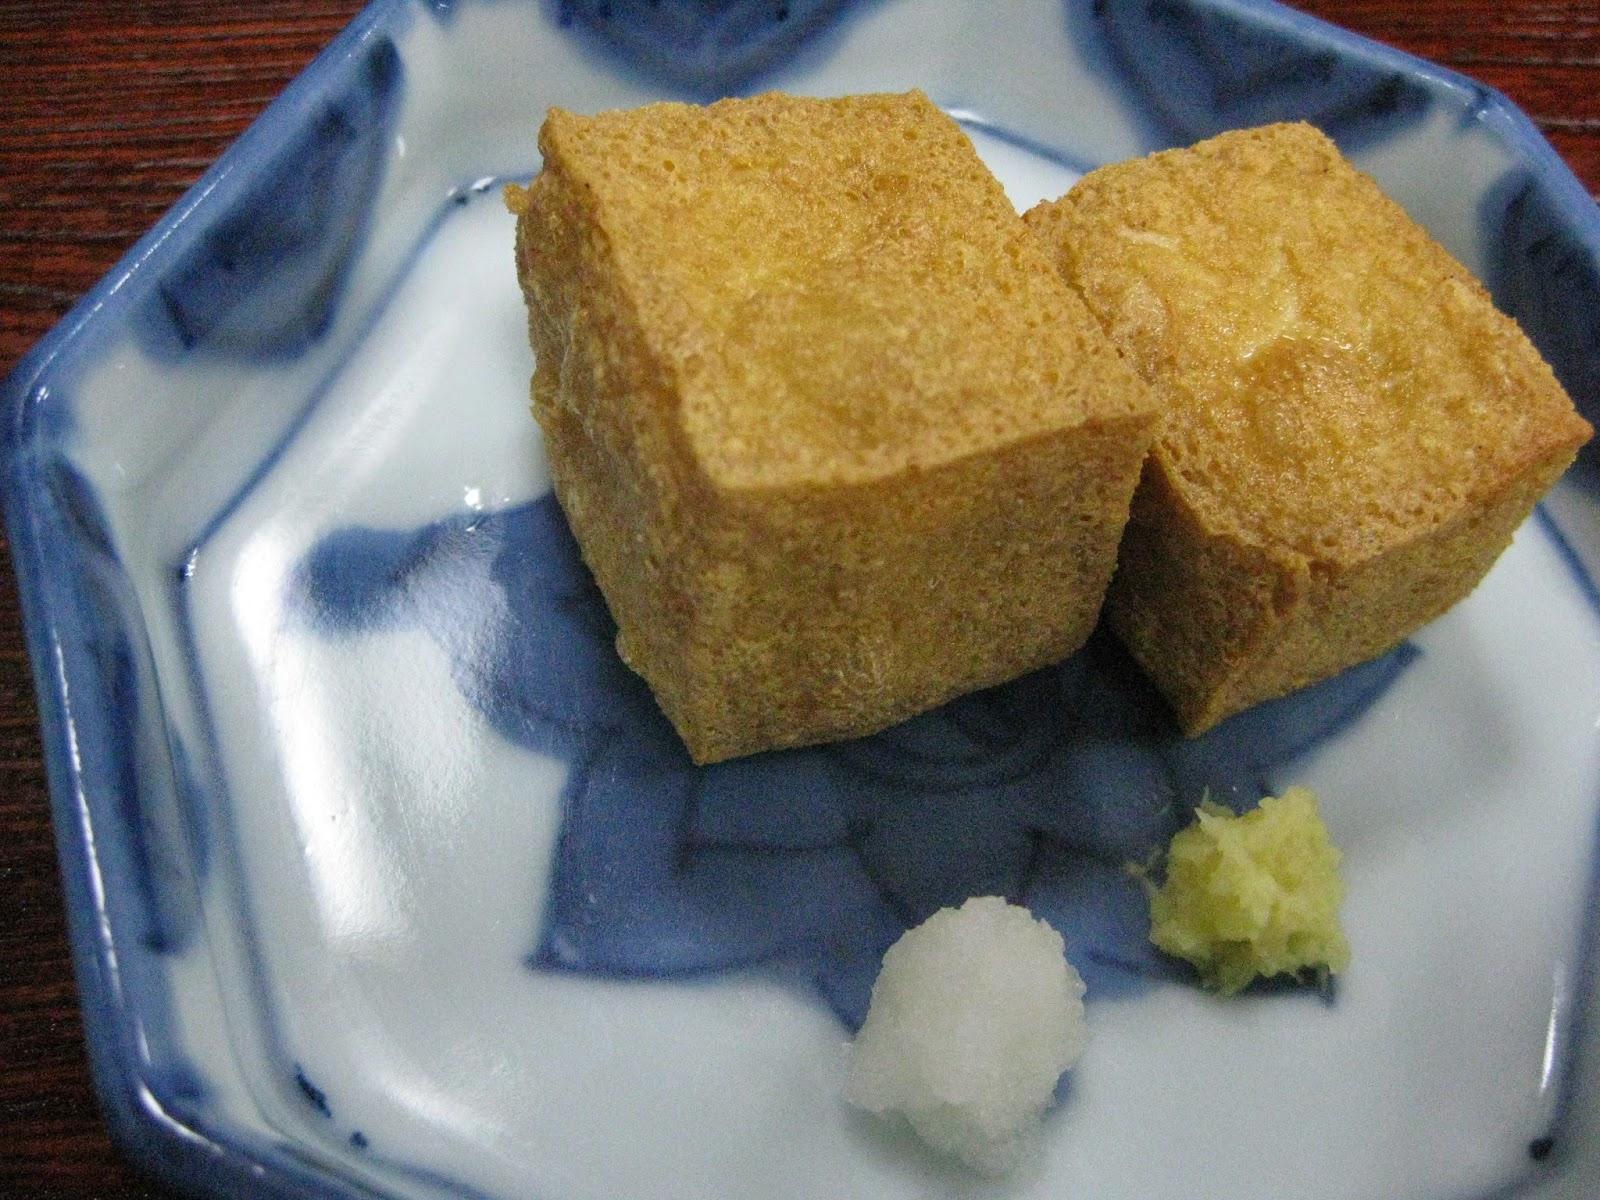 Tokyo - Tofu lunch course #5 - fried tofu